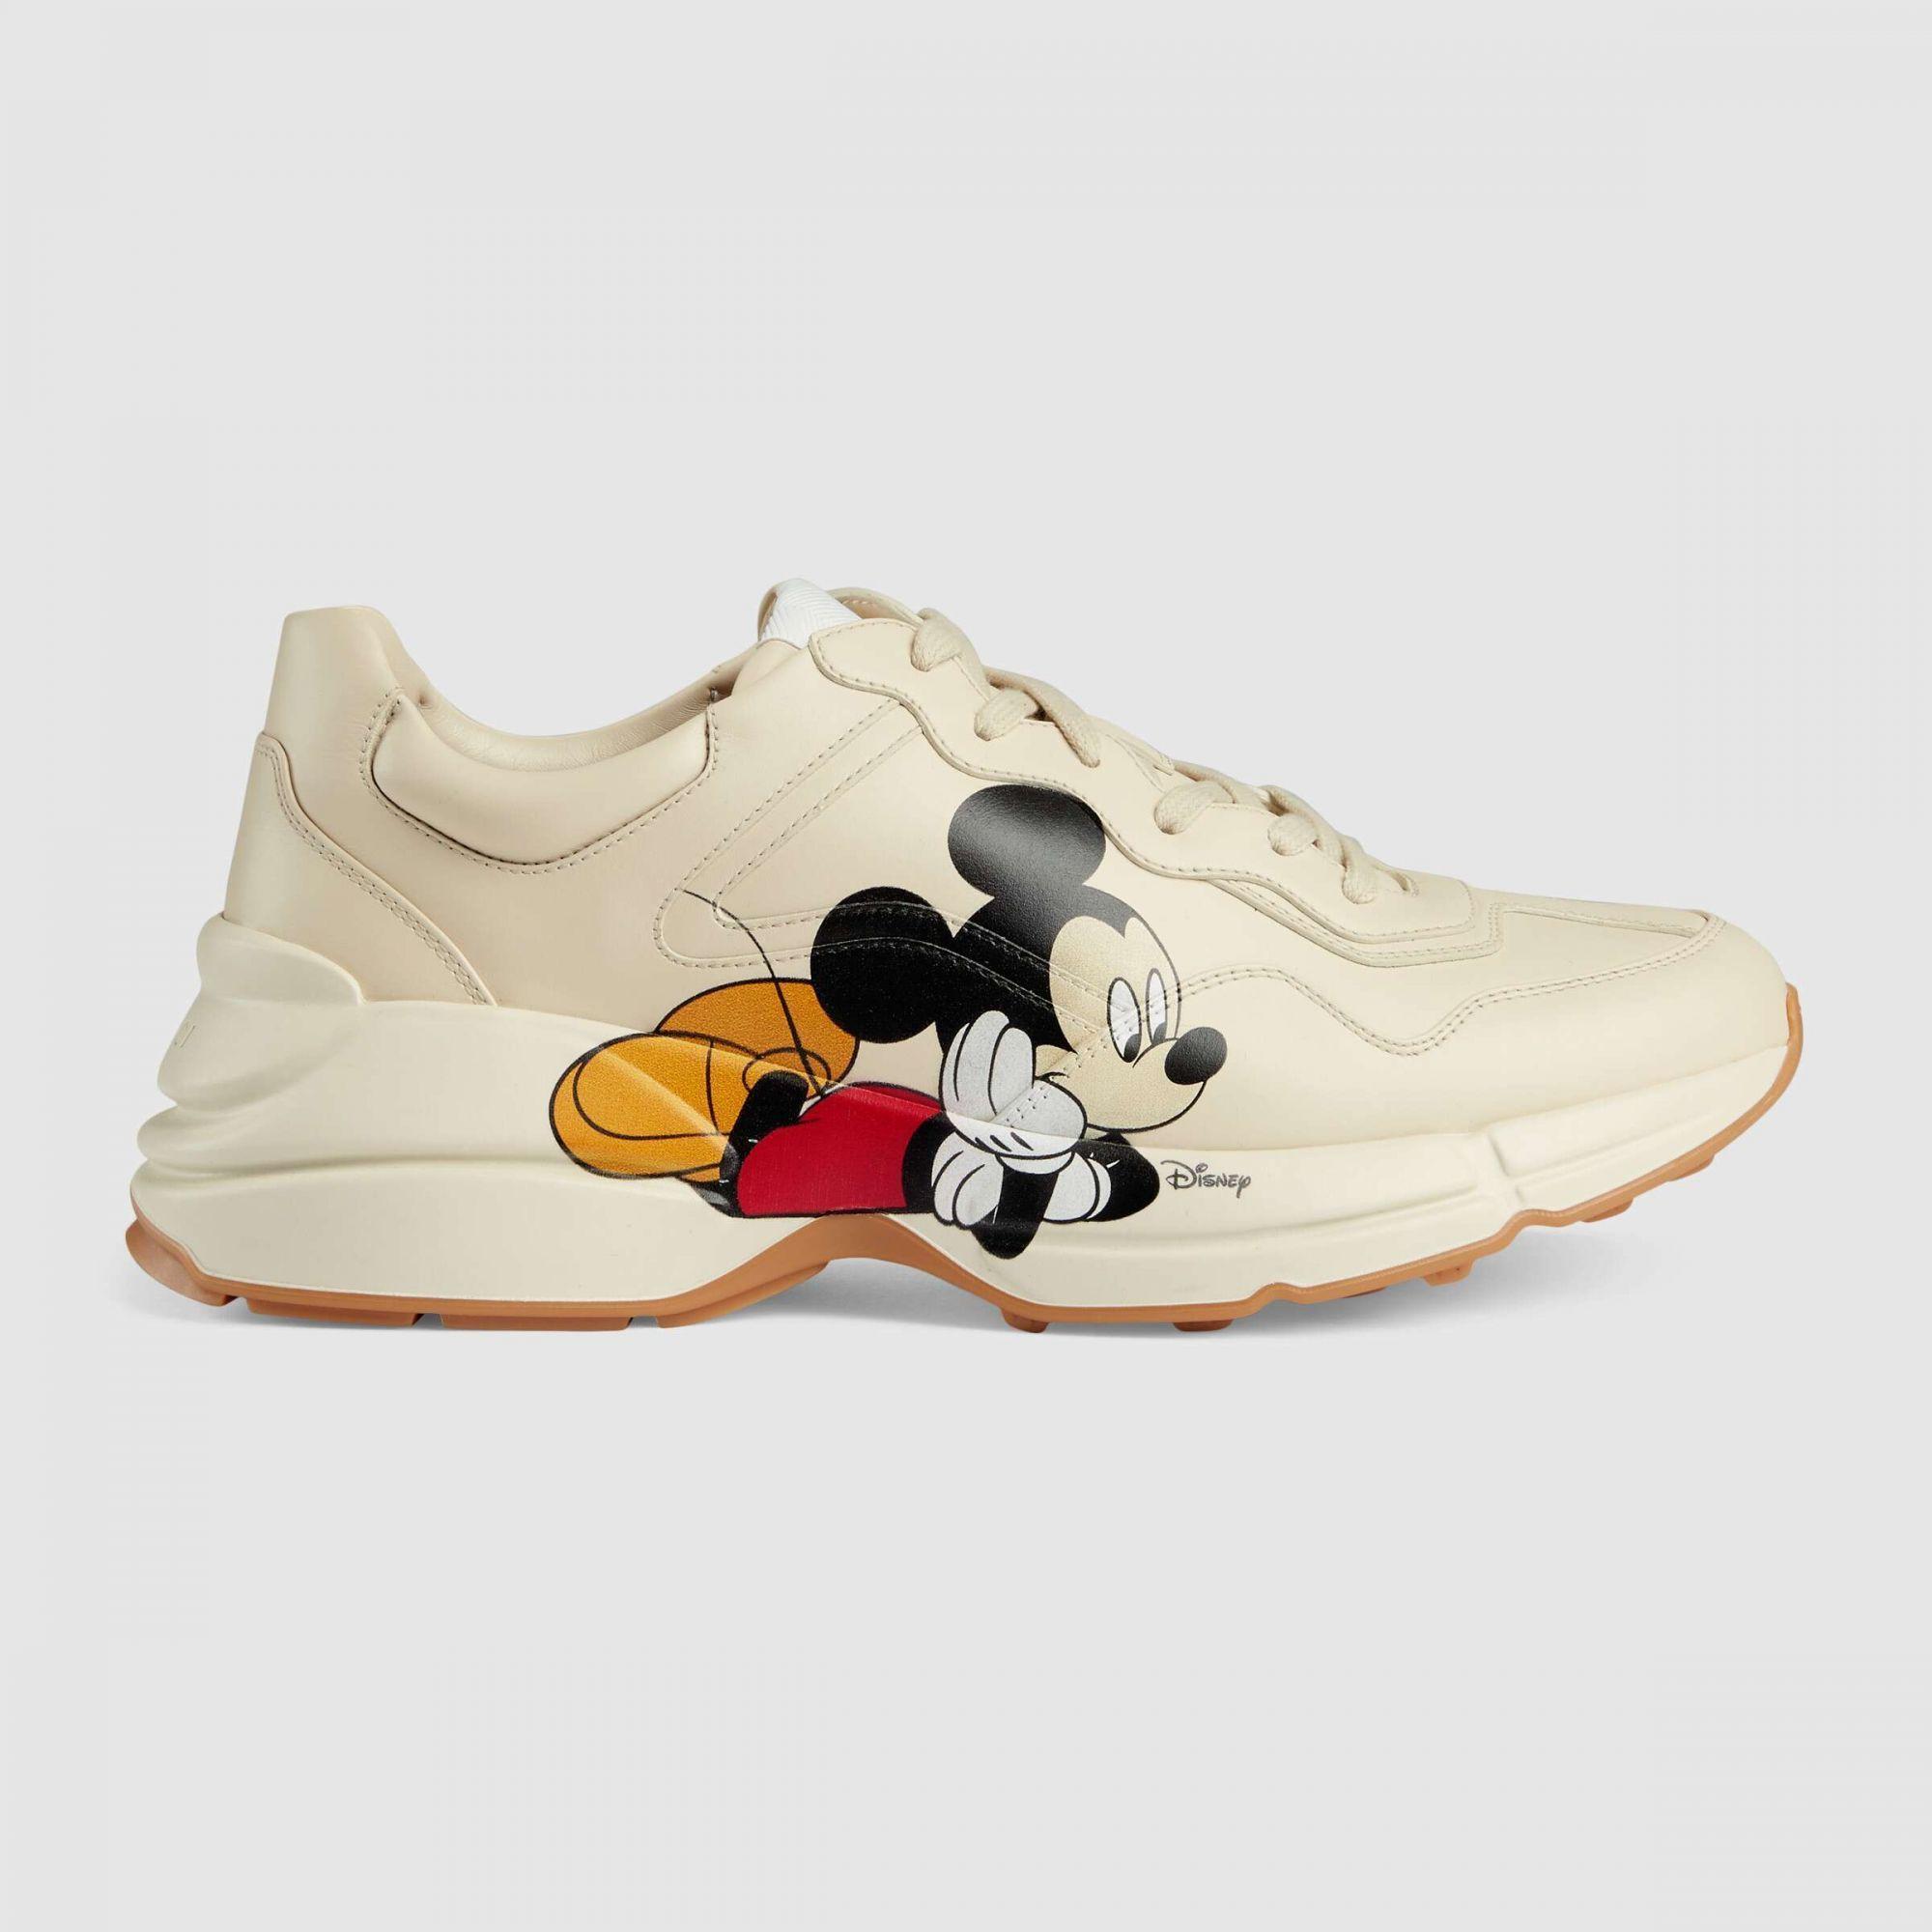 Sneaker Gucci Disney - Neomag.